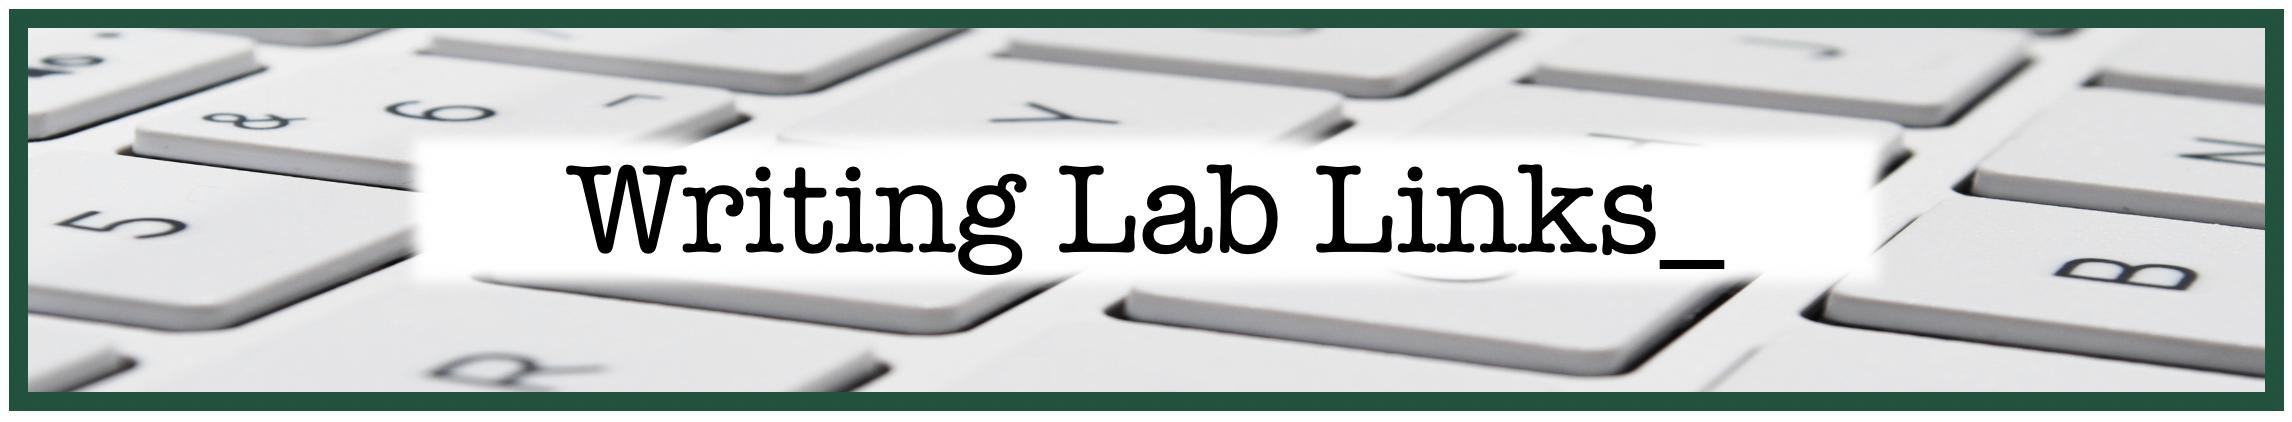 Writing Lab Links